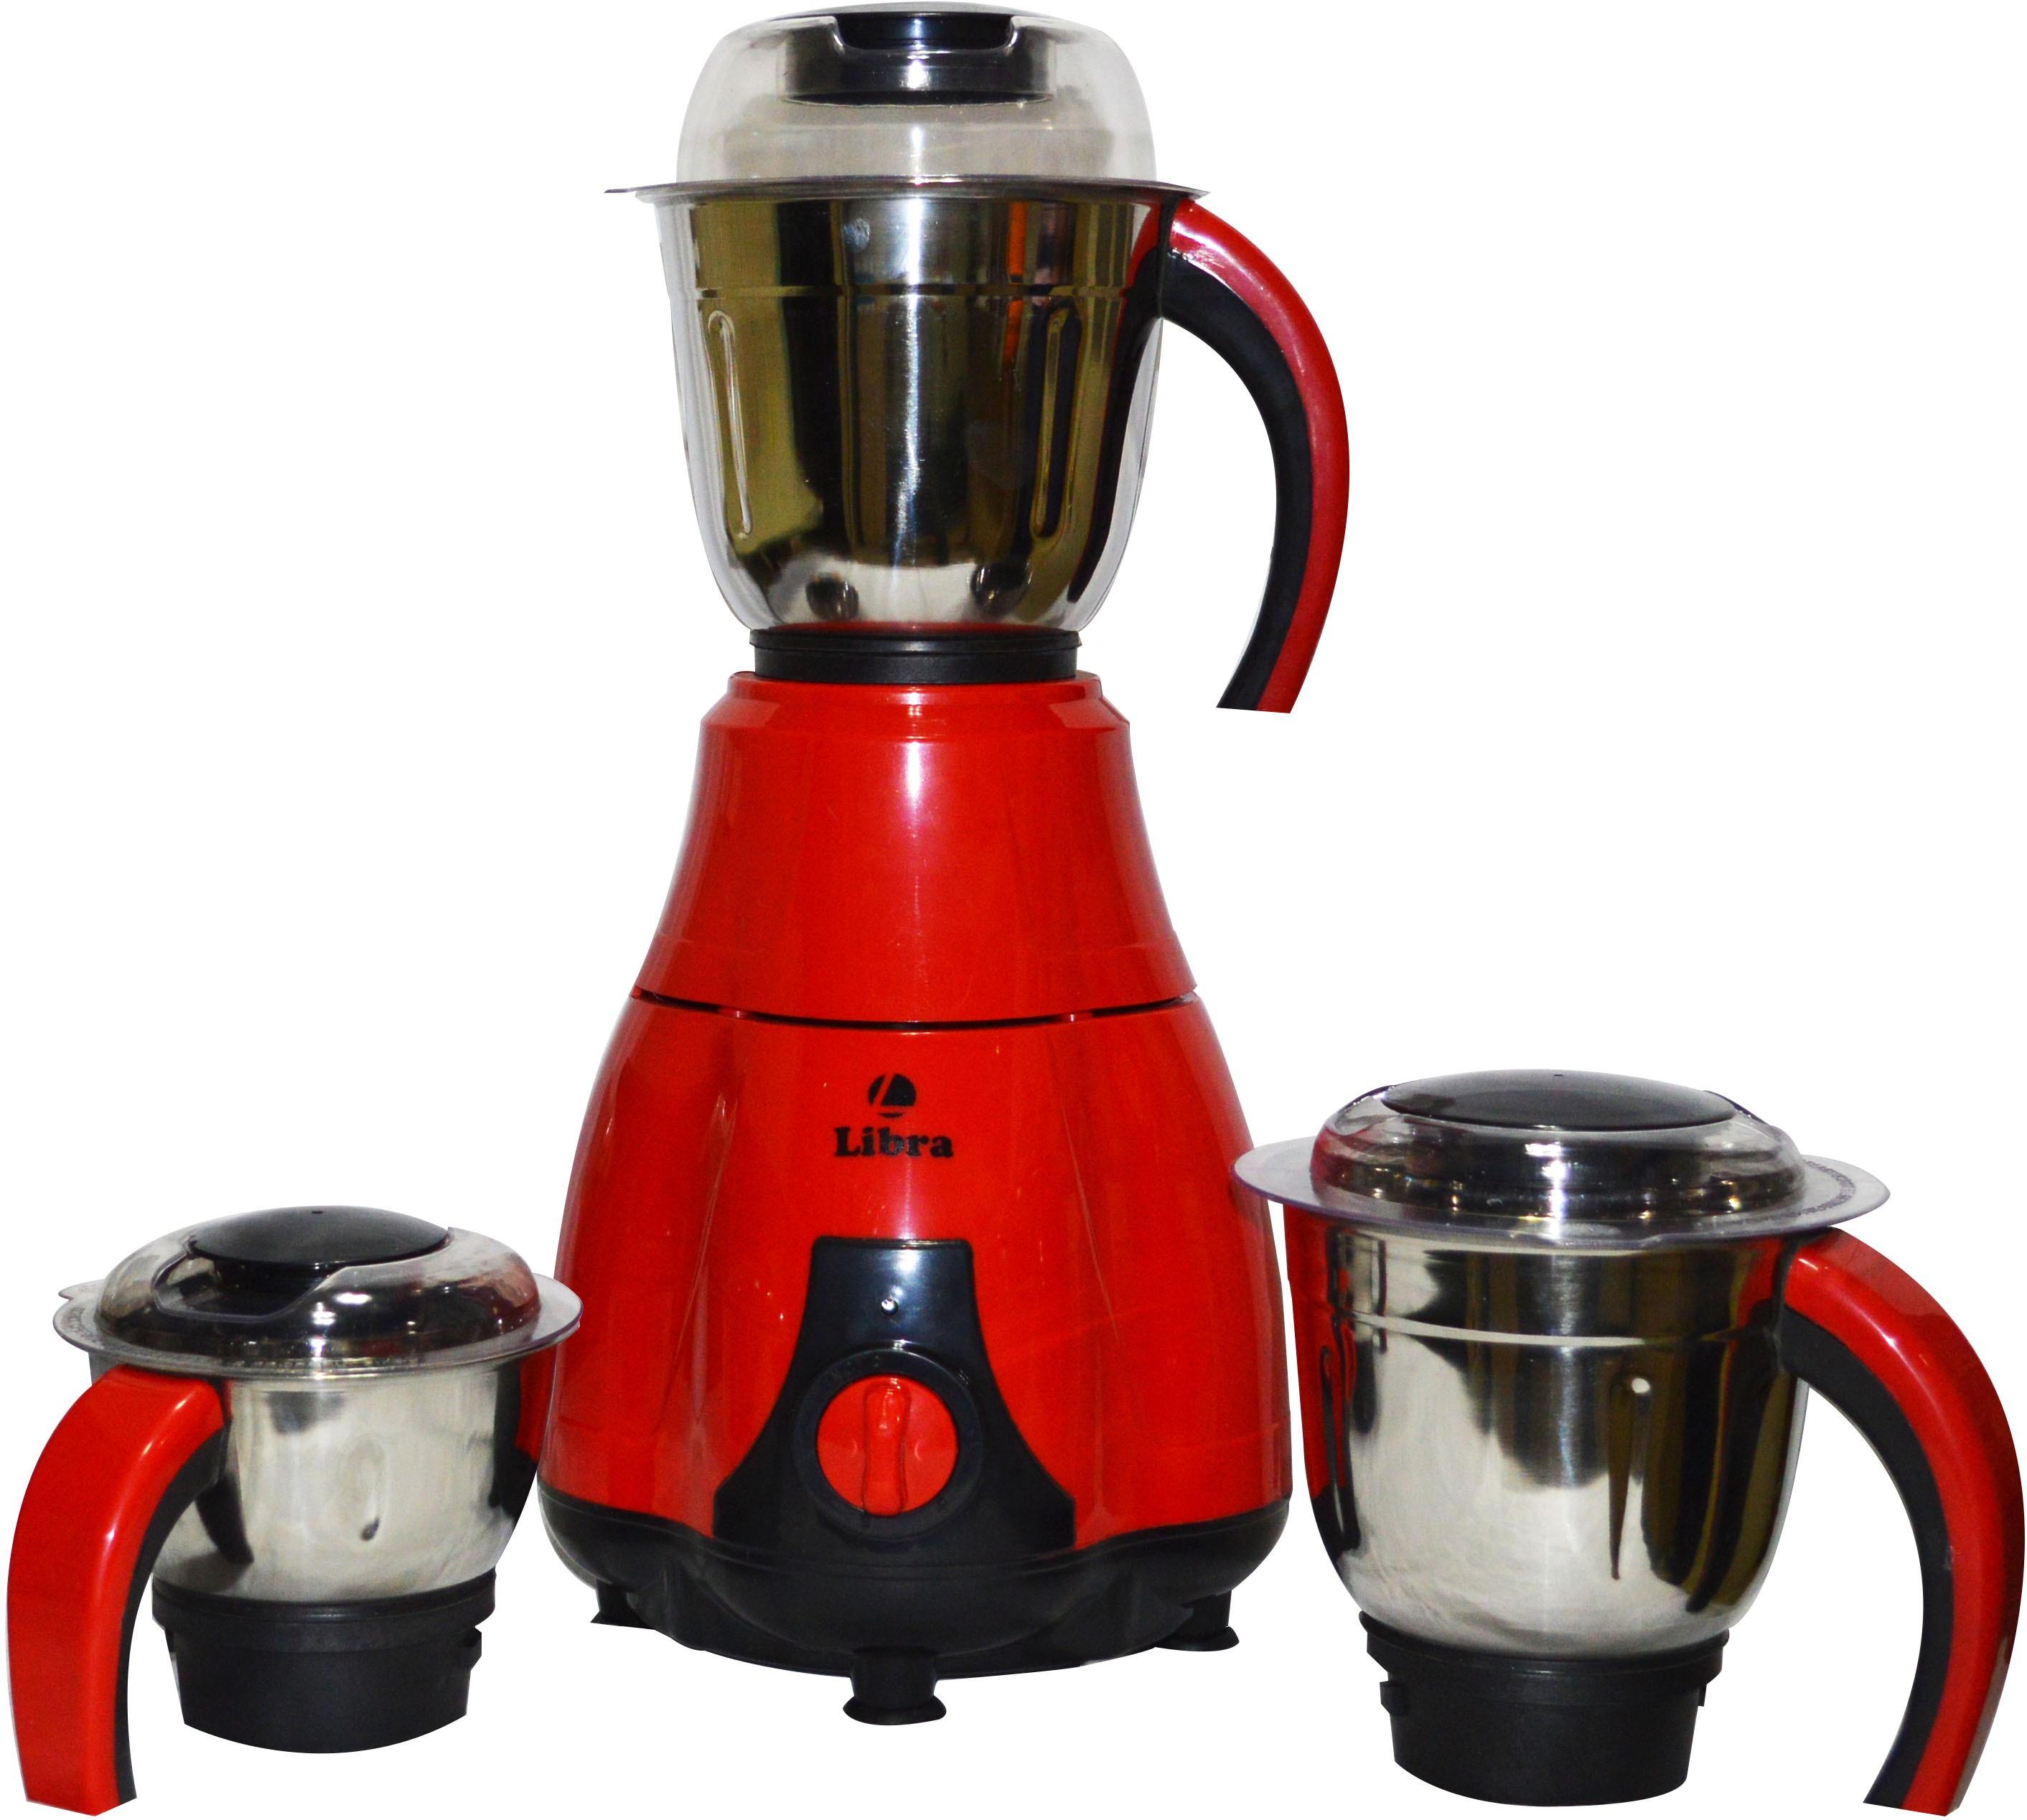 Home & Kitchen Appliances India Pricyfy